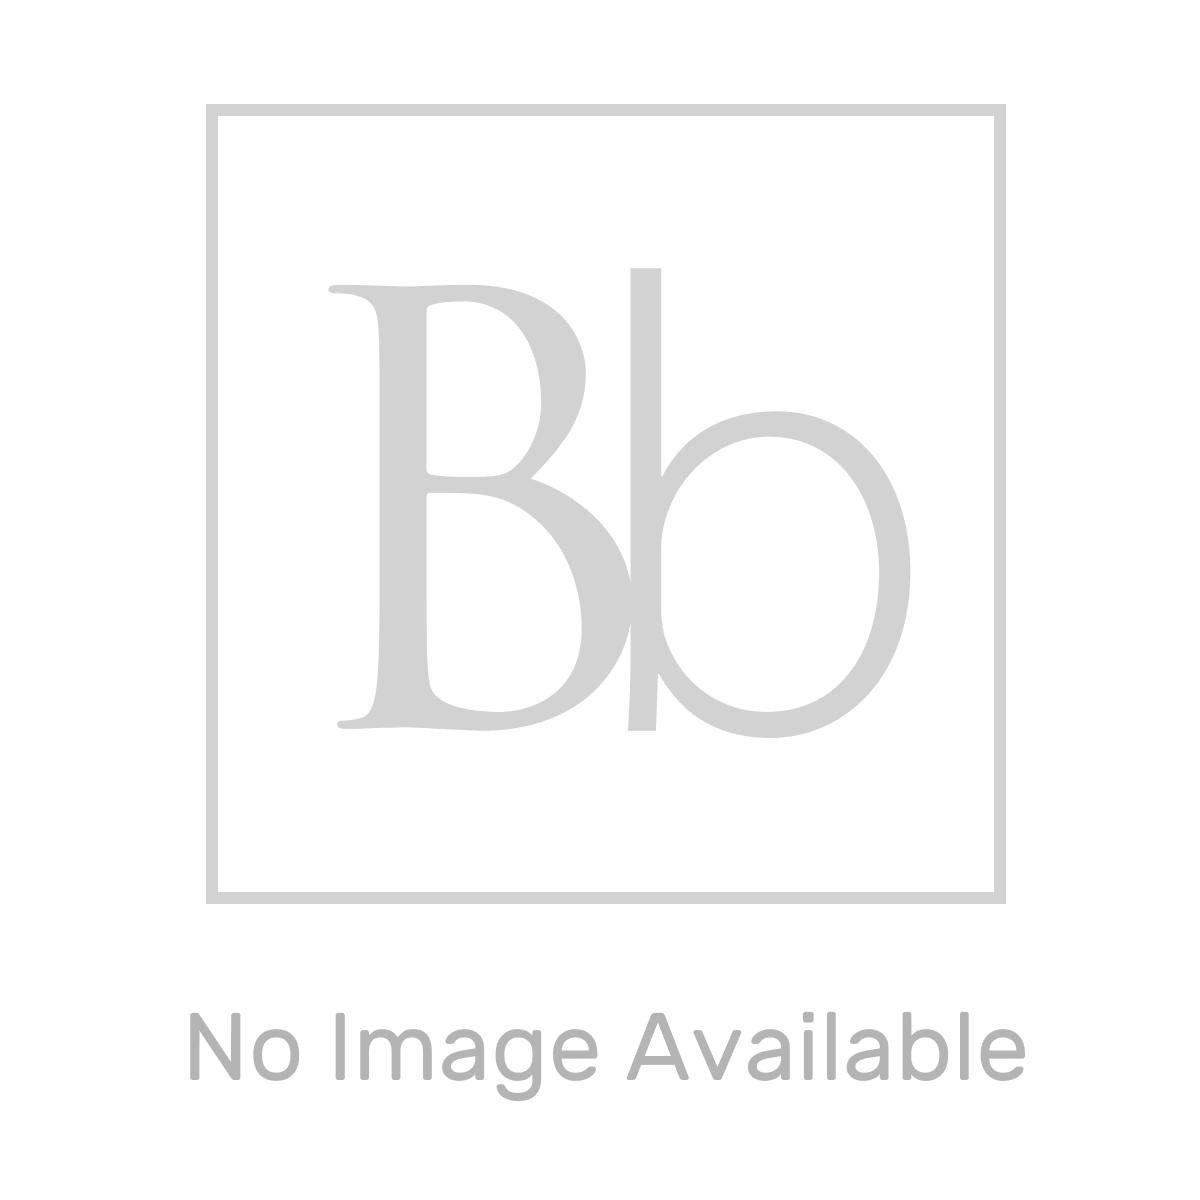 Aquadart Grey Slate Shower Tray 1700 x 700 Overhead